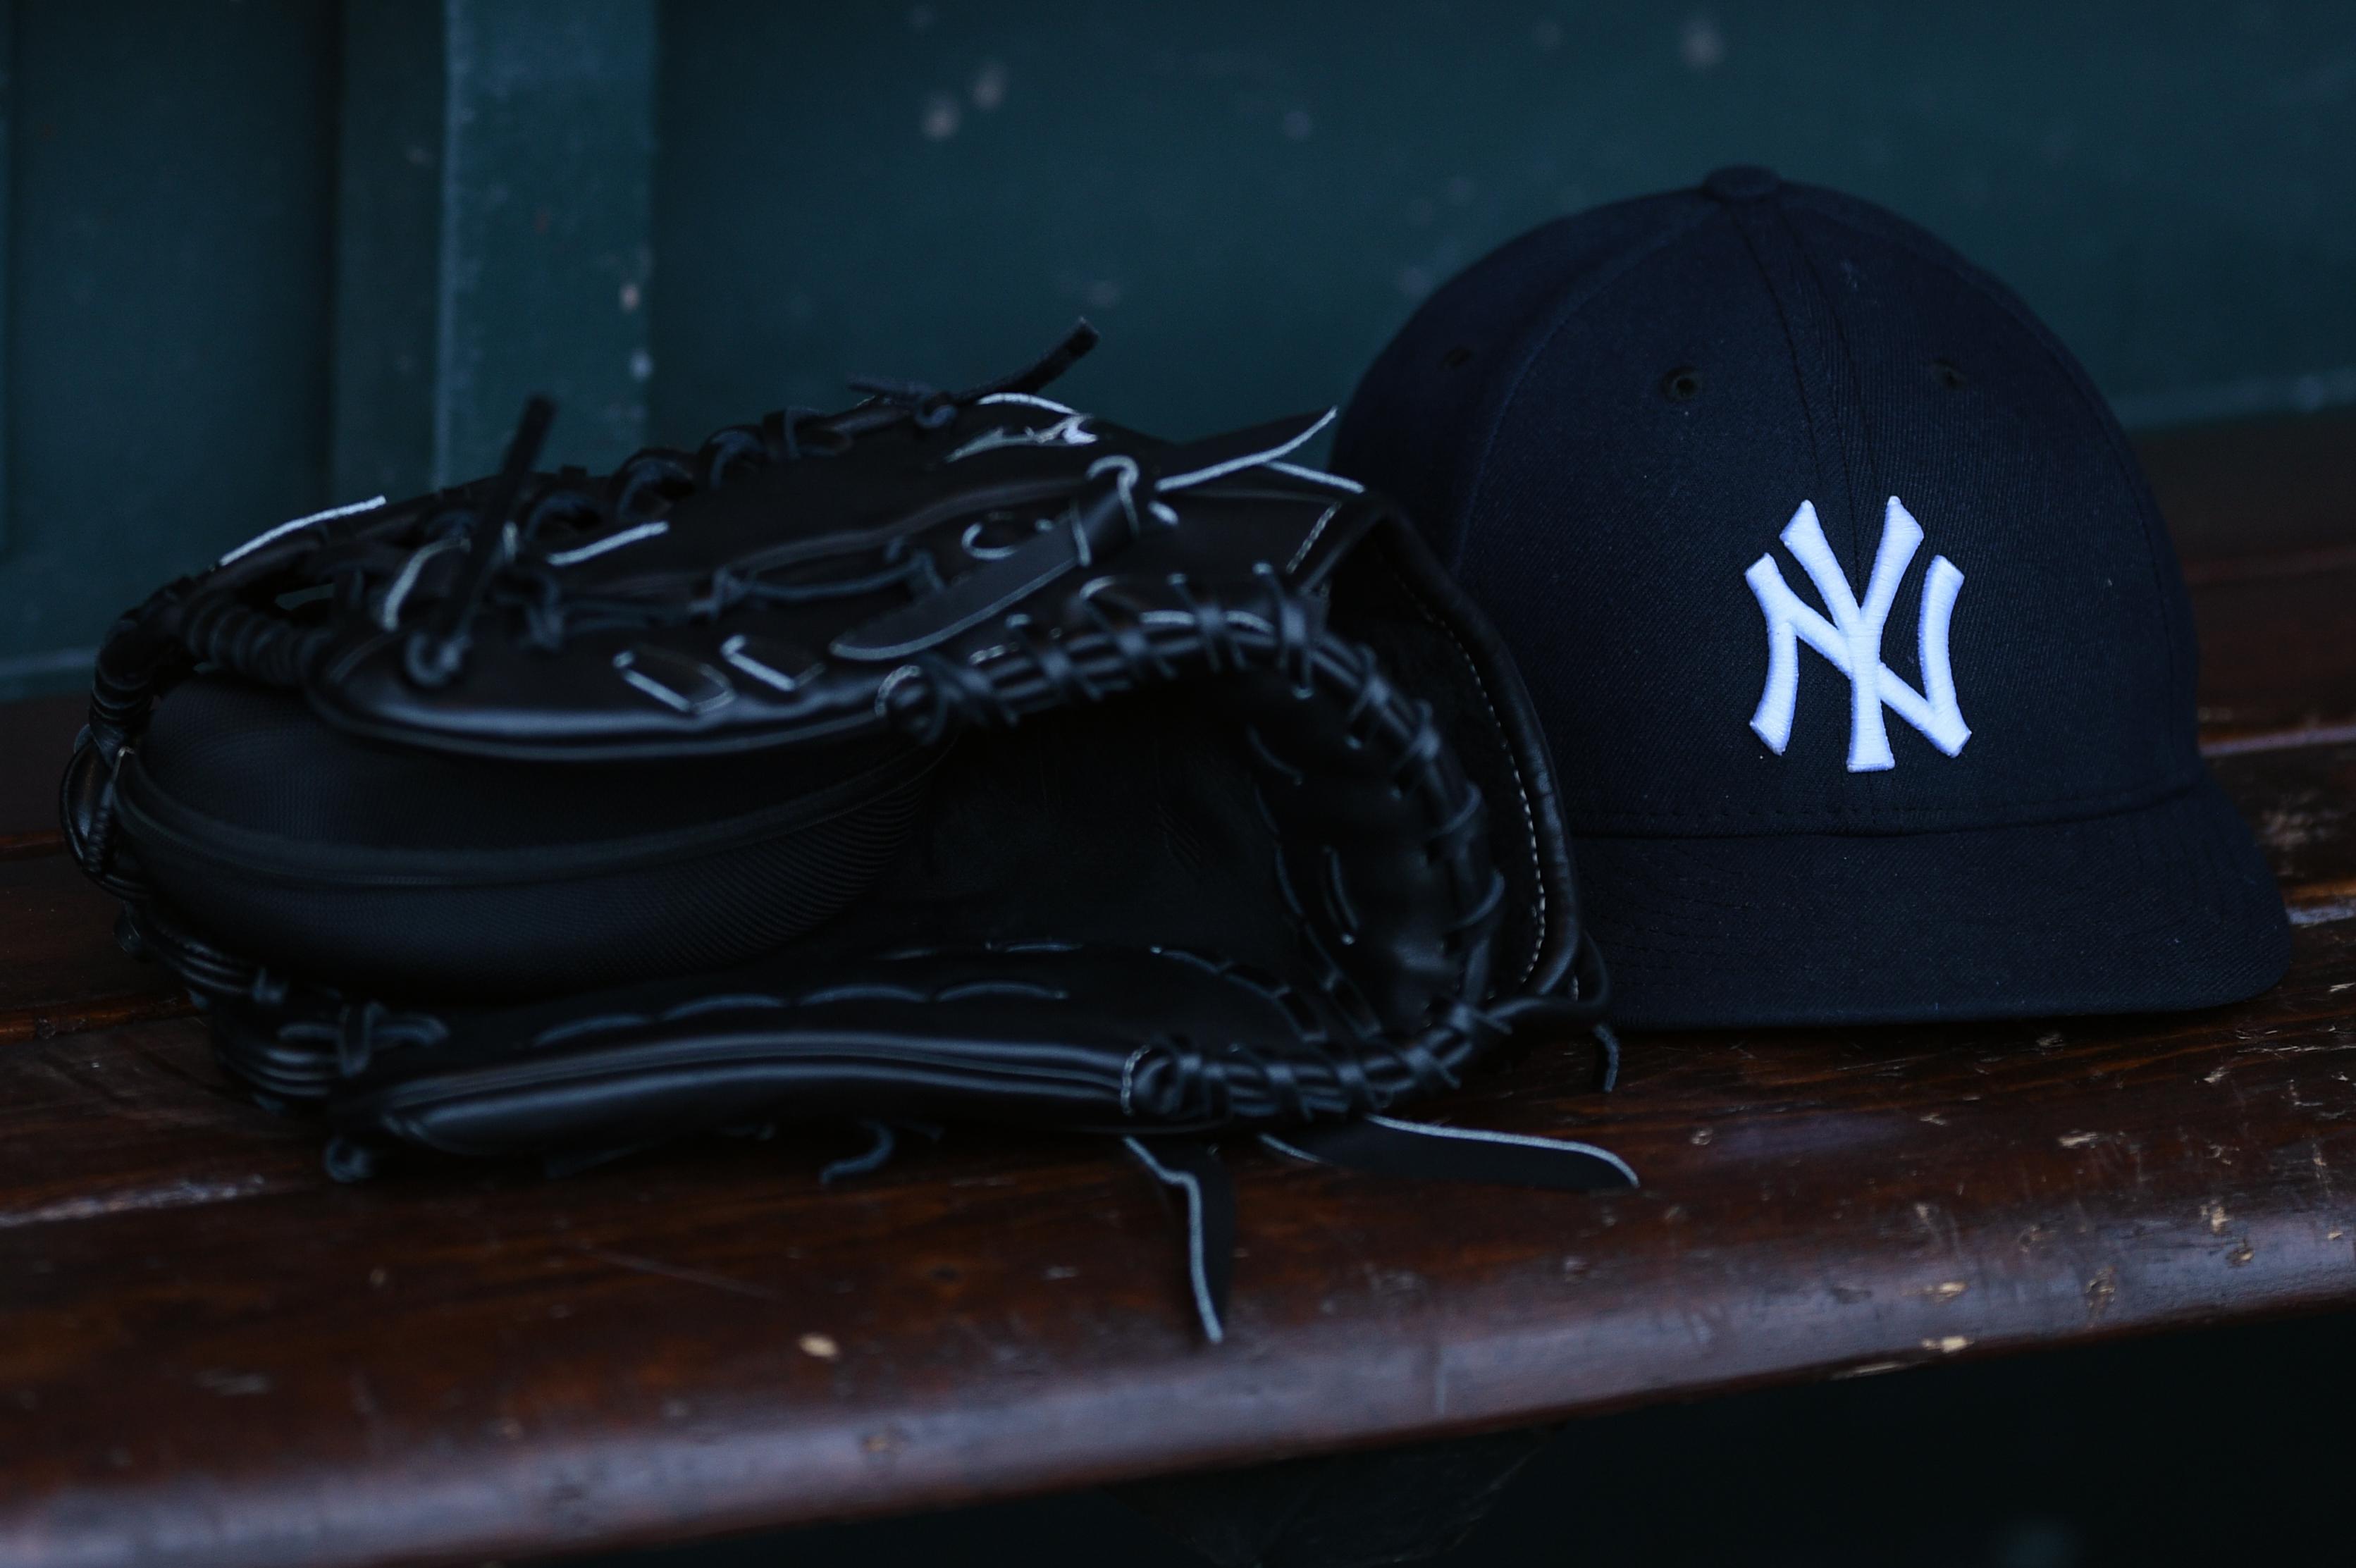 MLB: APR 26 Yankees at Giants